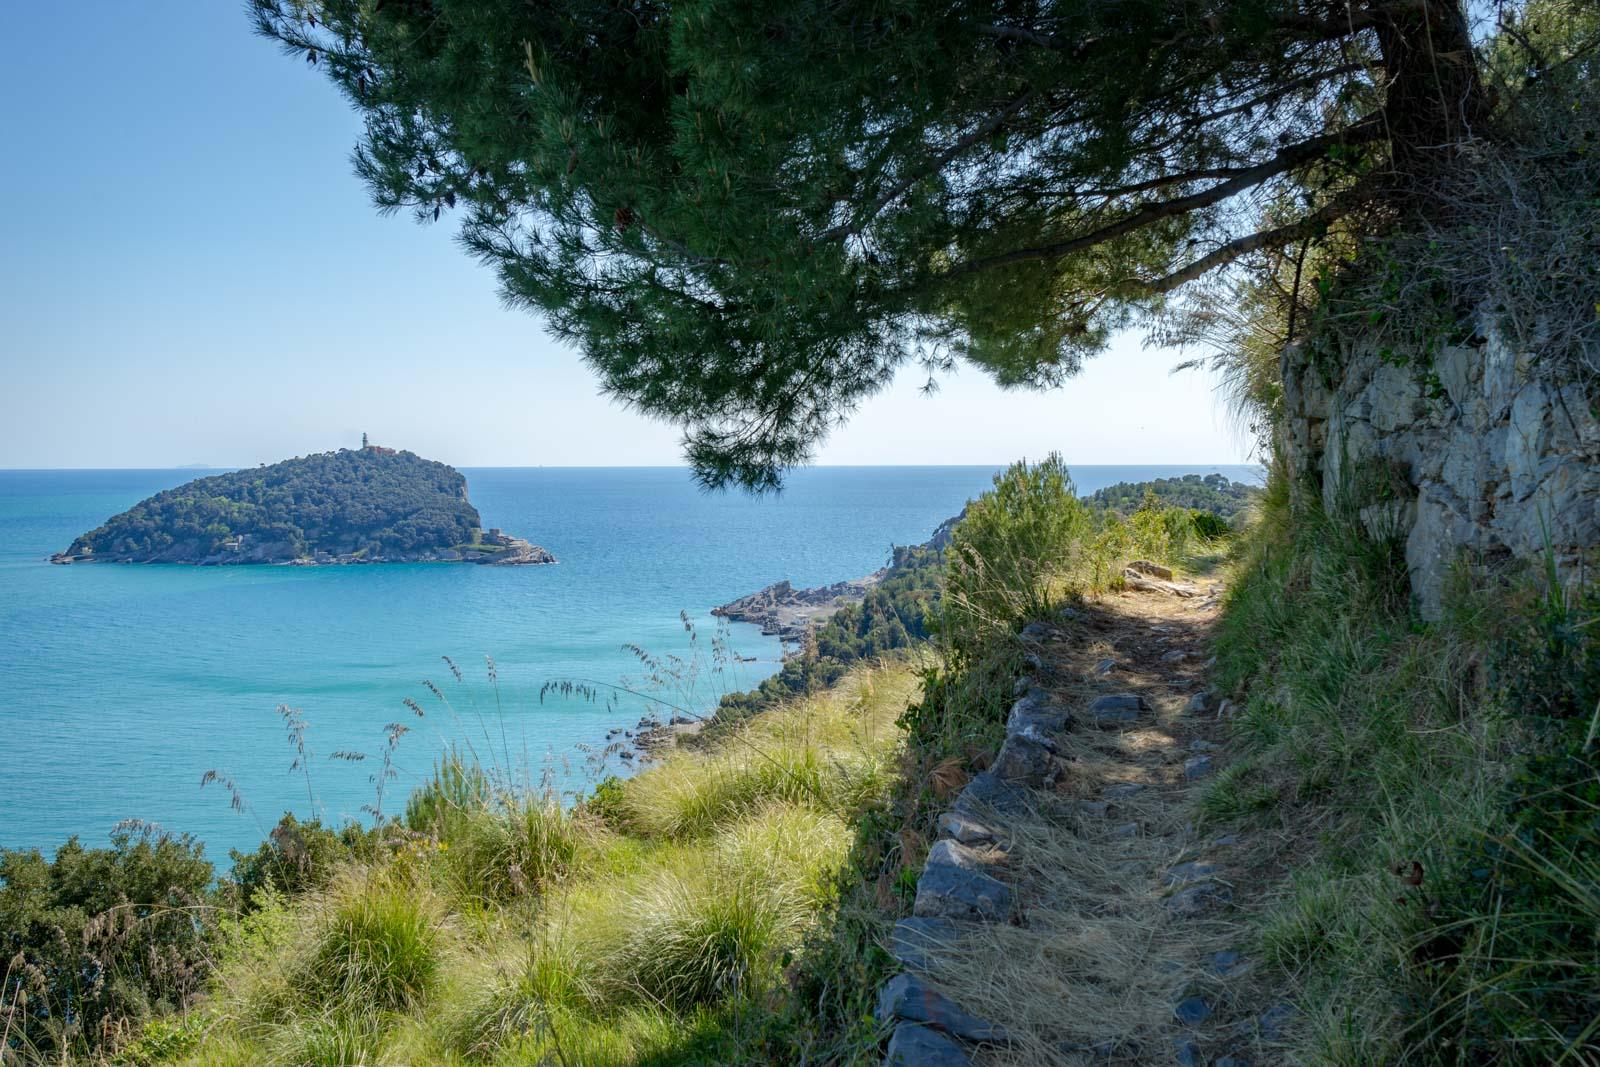 Portovenere and Palmaria Island, Cinque Terre, Itlay